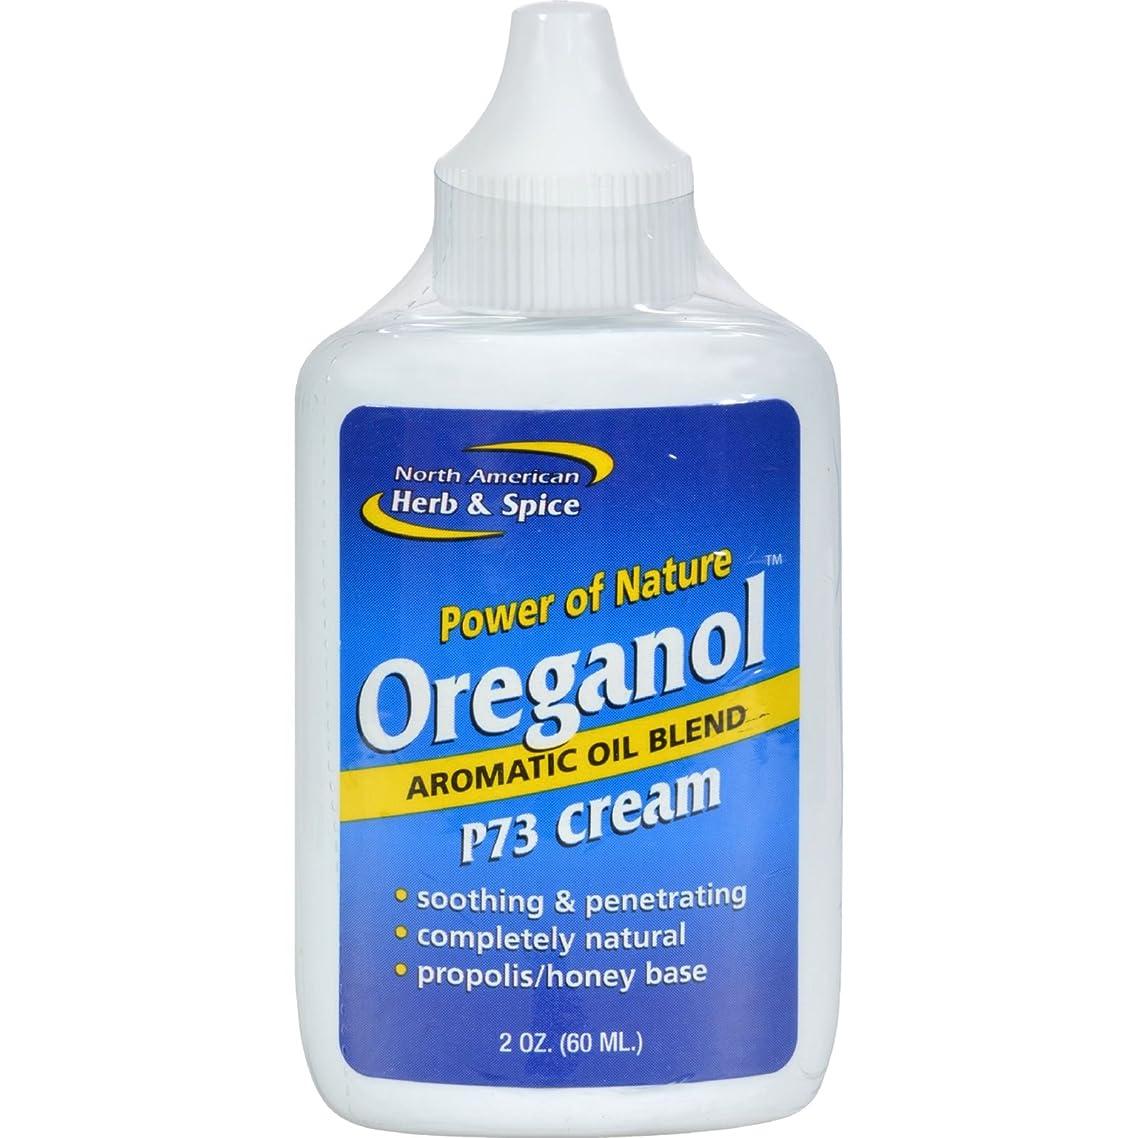 North American Herb and Spice Oreganol Oil of Oregano Cream - 2 oz (Pack of 2)